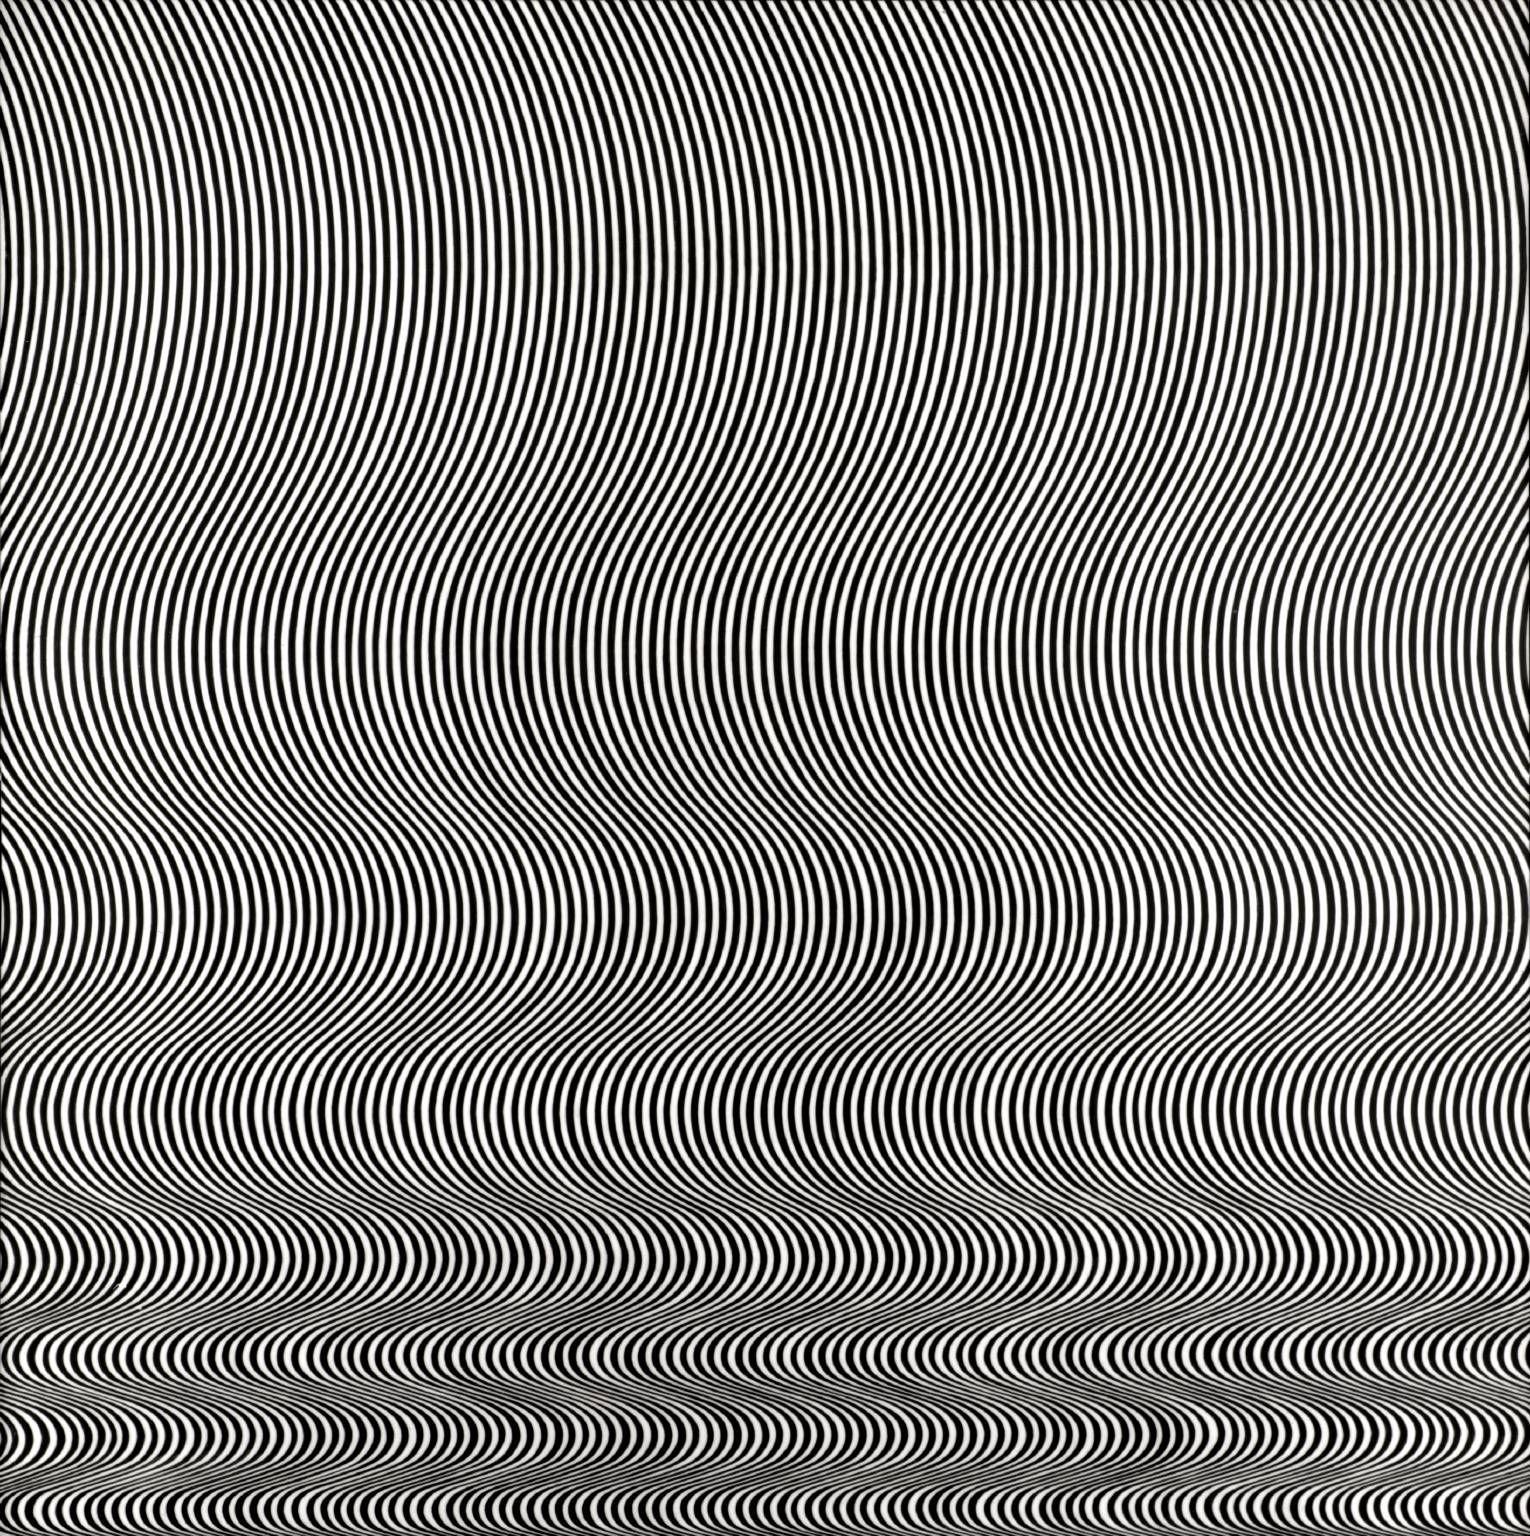 Rhythmic Line Designs And Patterns